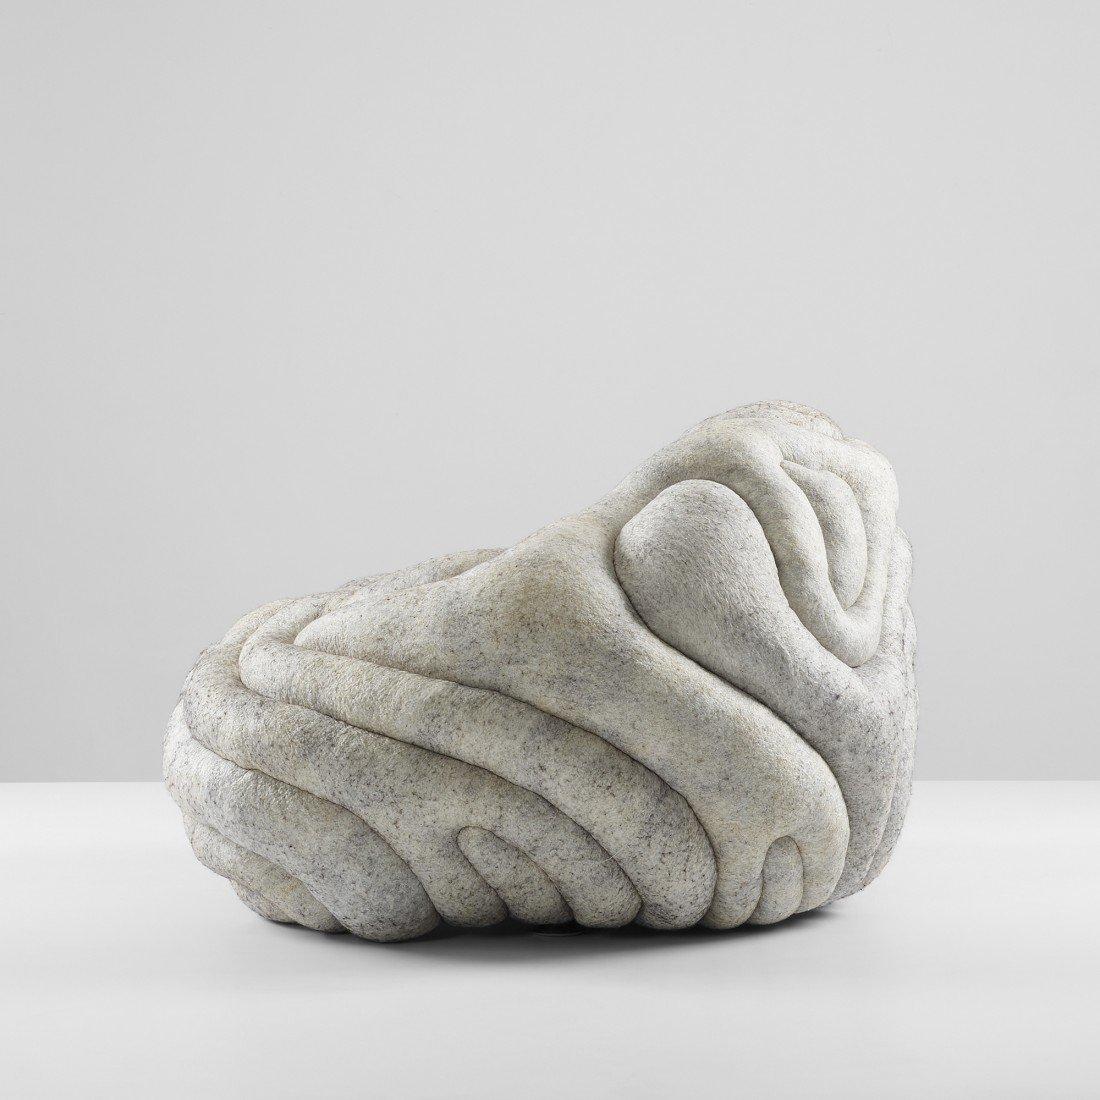 117: Ayala Serfaty Blanco Cristal chair